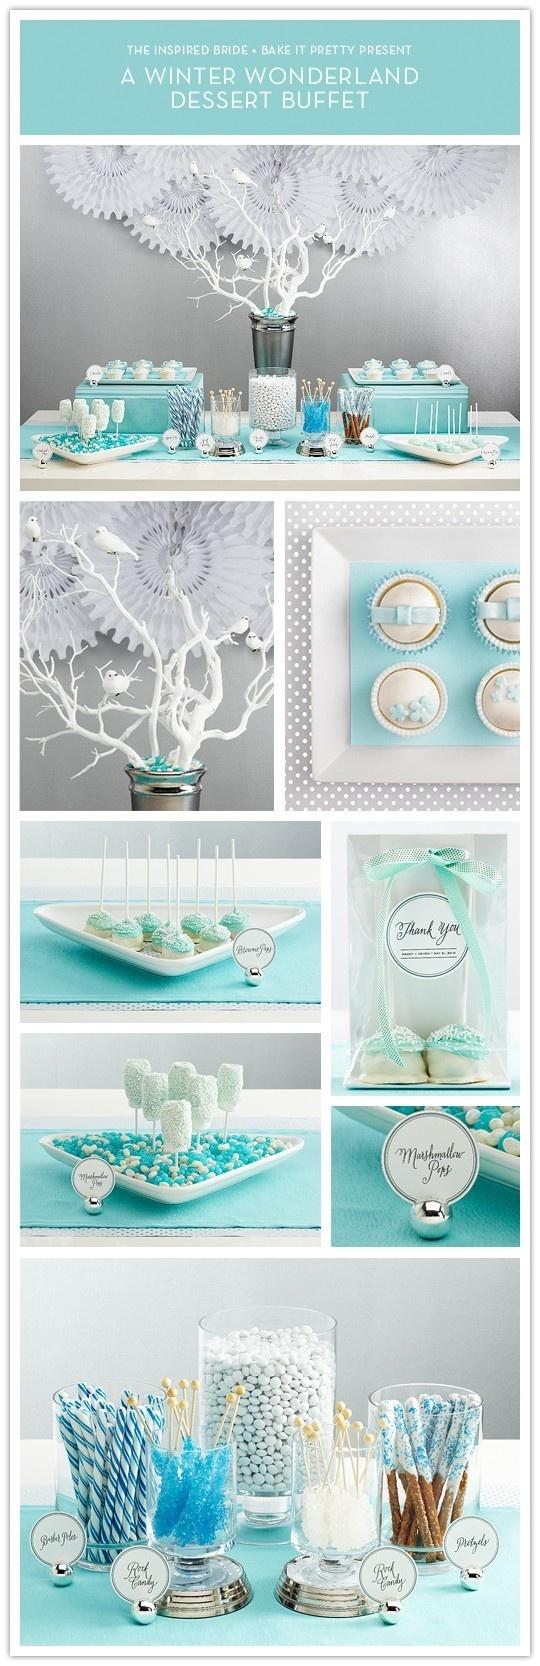 299 best Food kawaii sweet table images on Pinterest | Desserts ...